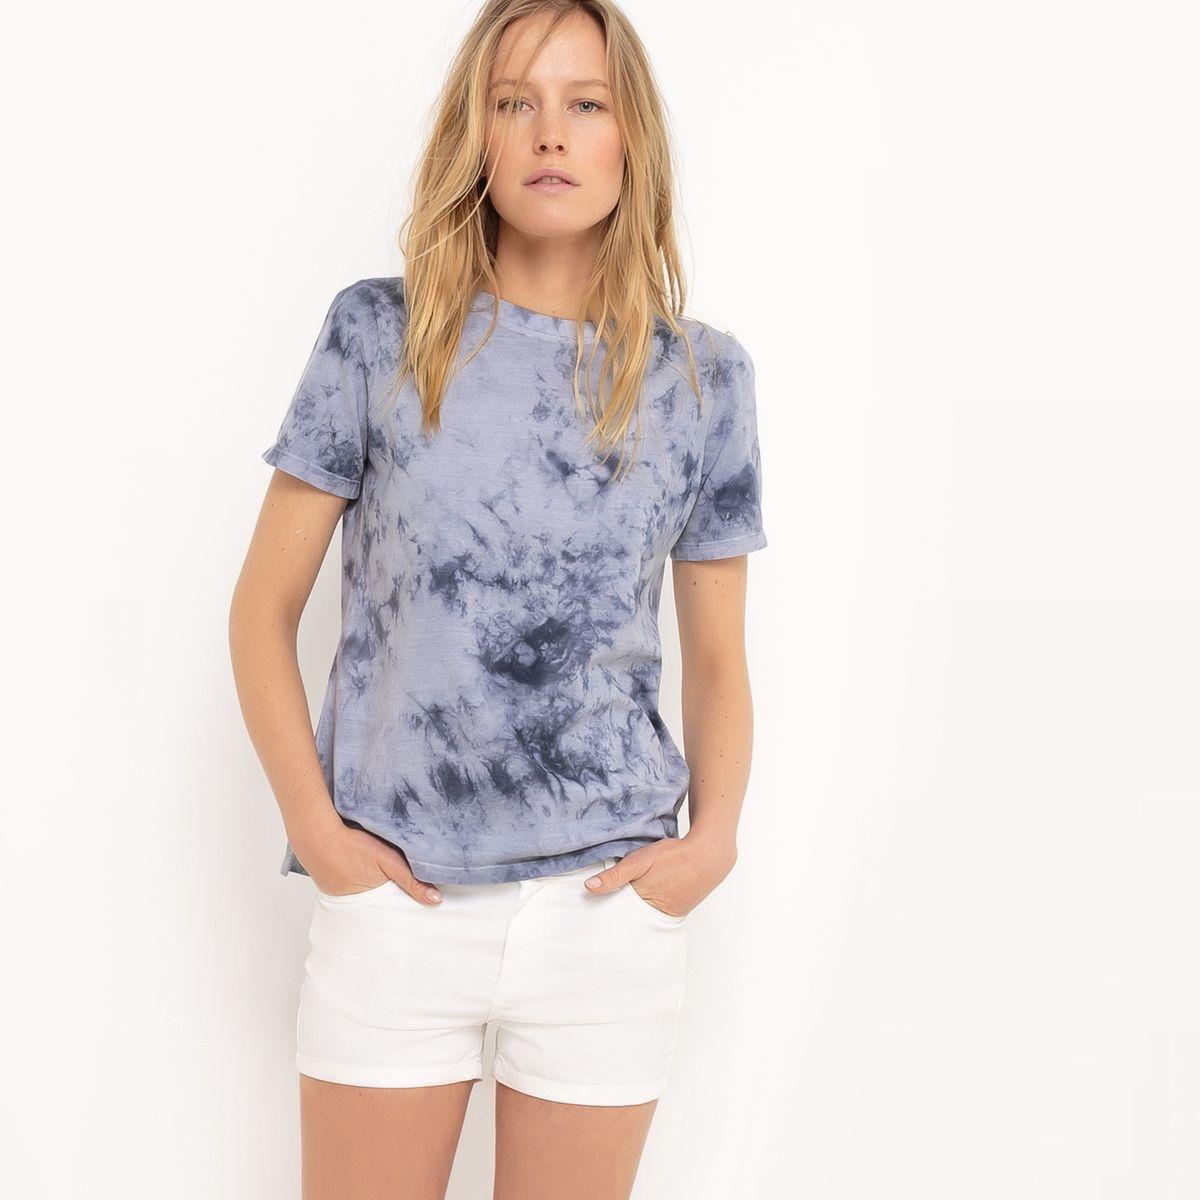 Tee-shirt imprimé marbre